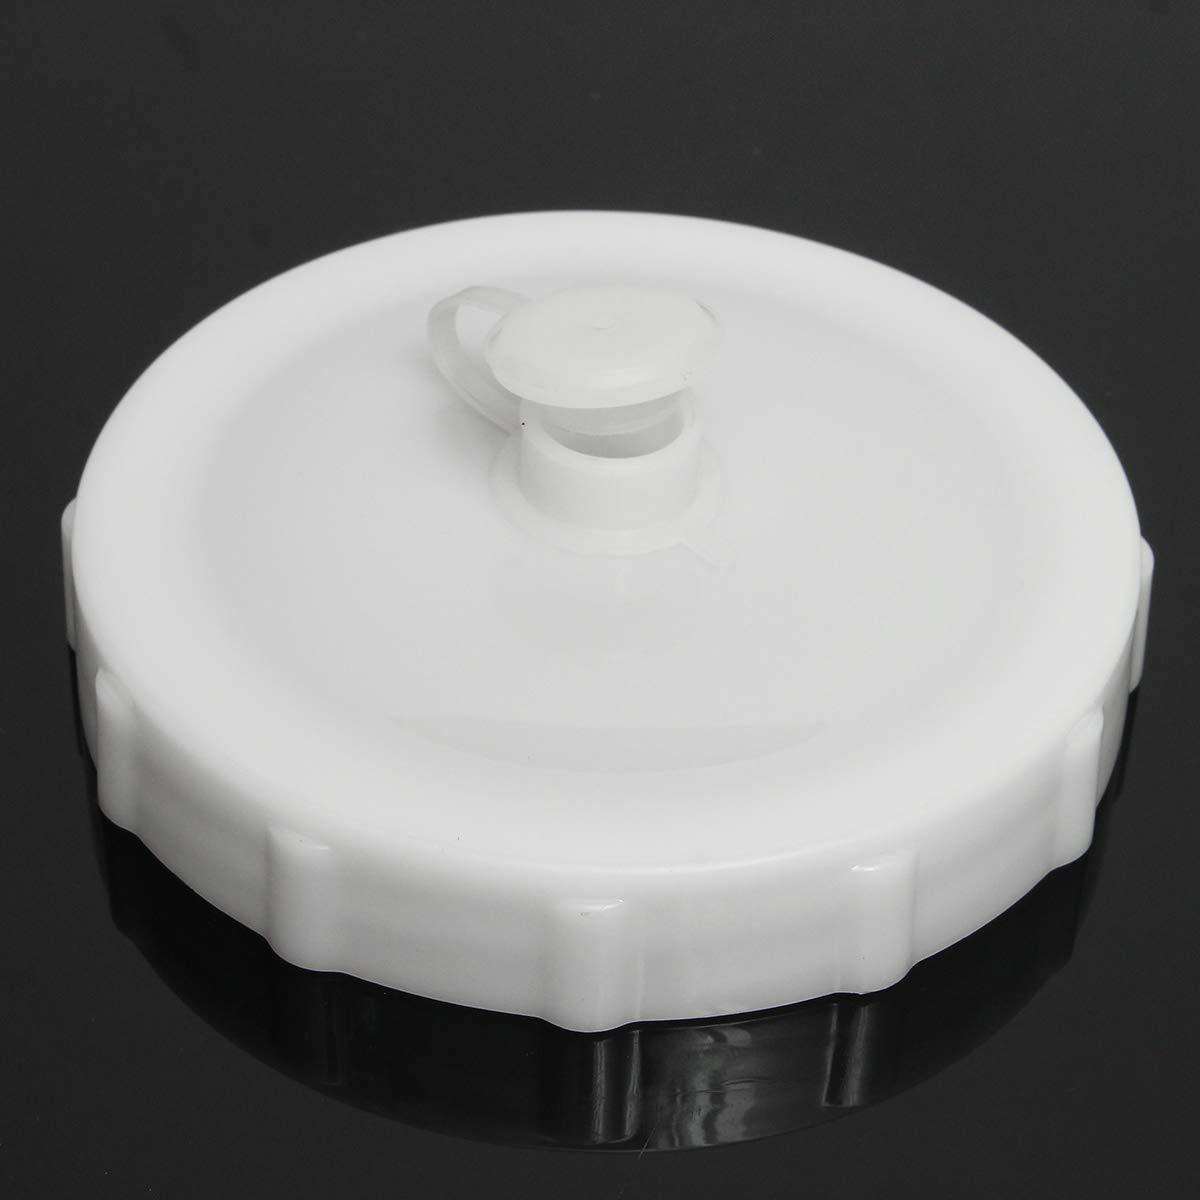 MYAMIA 600Ml Rubber Sprayer Cup Ersatzpot for Devilbiss GTI//Tekna Pro Pri FLG Sprayer